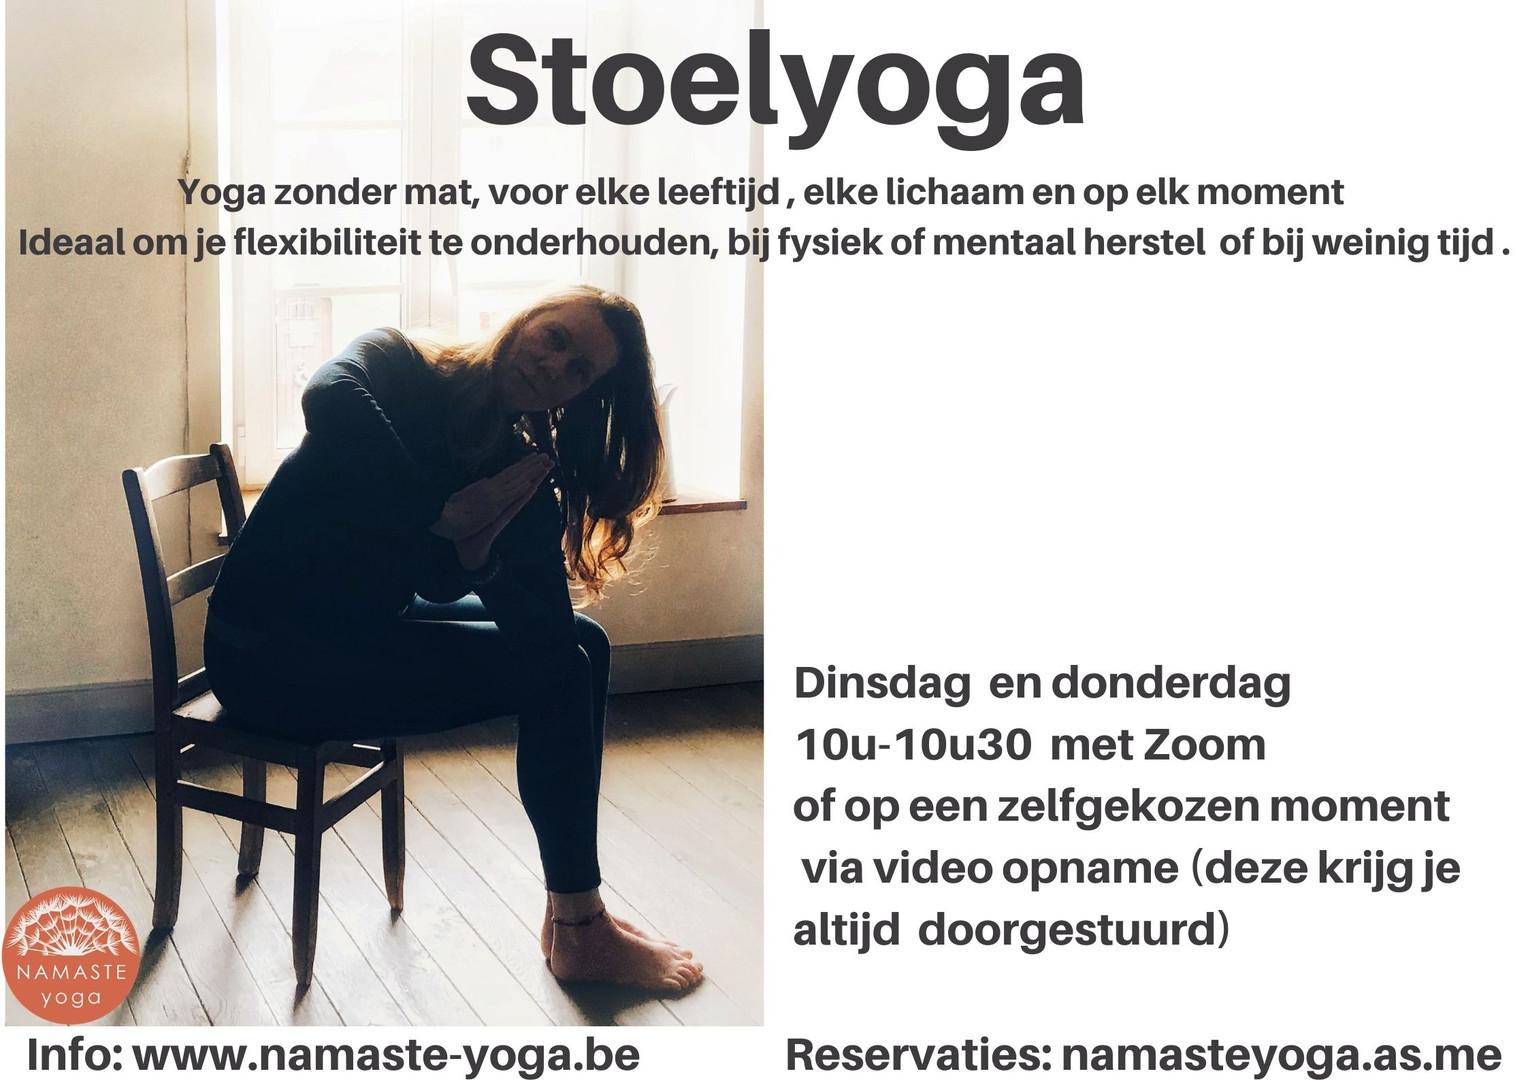 Stoelyoga